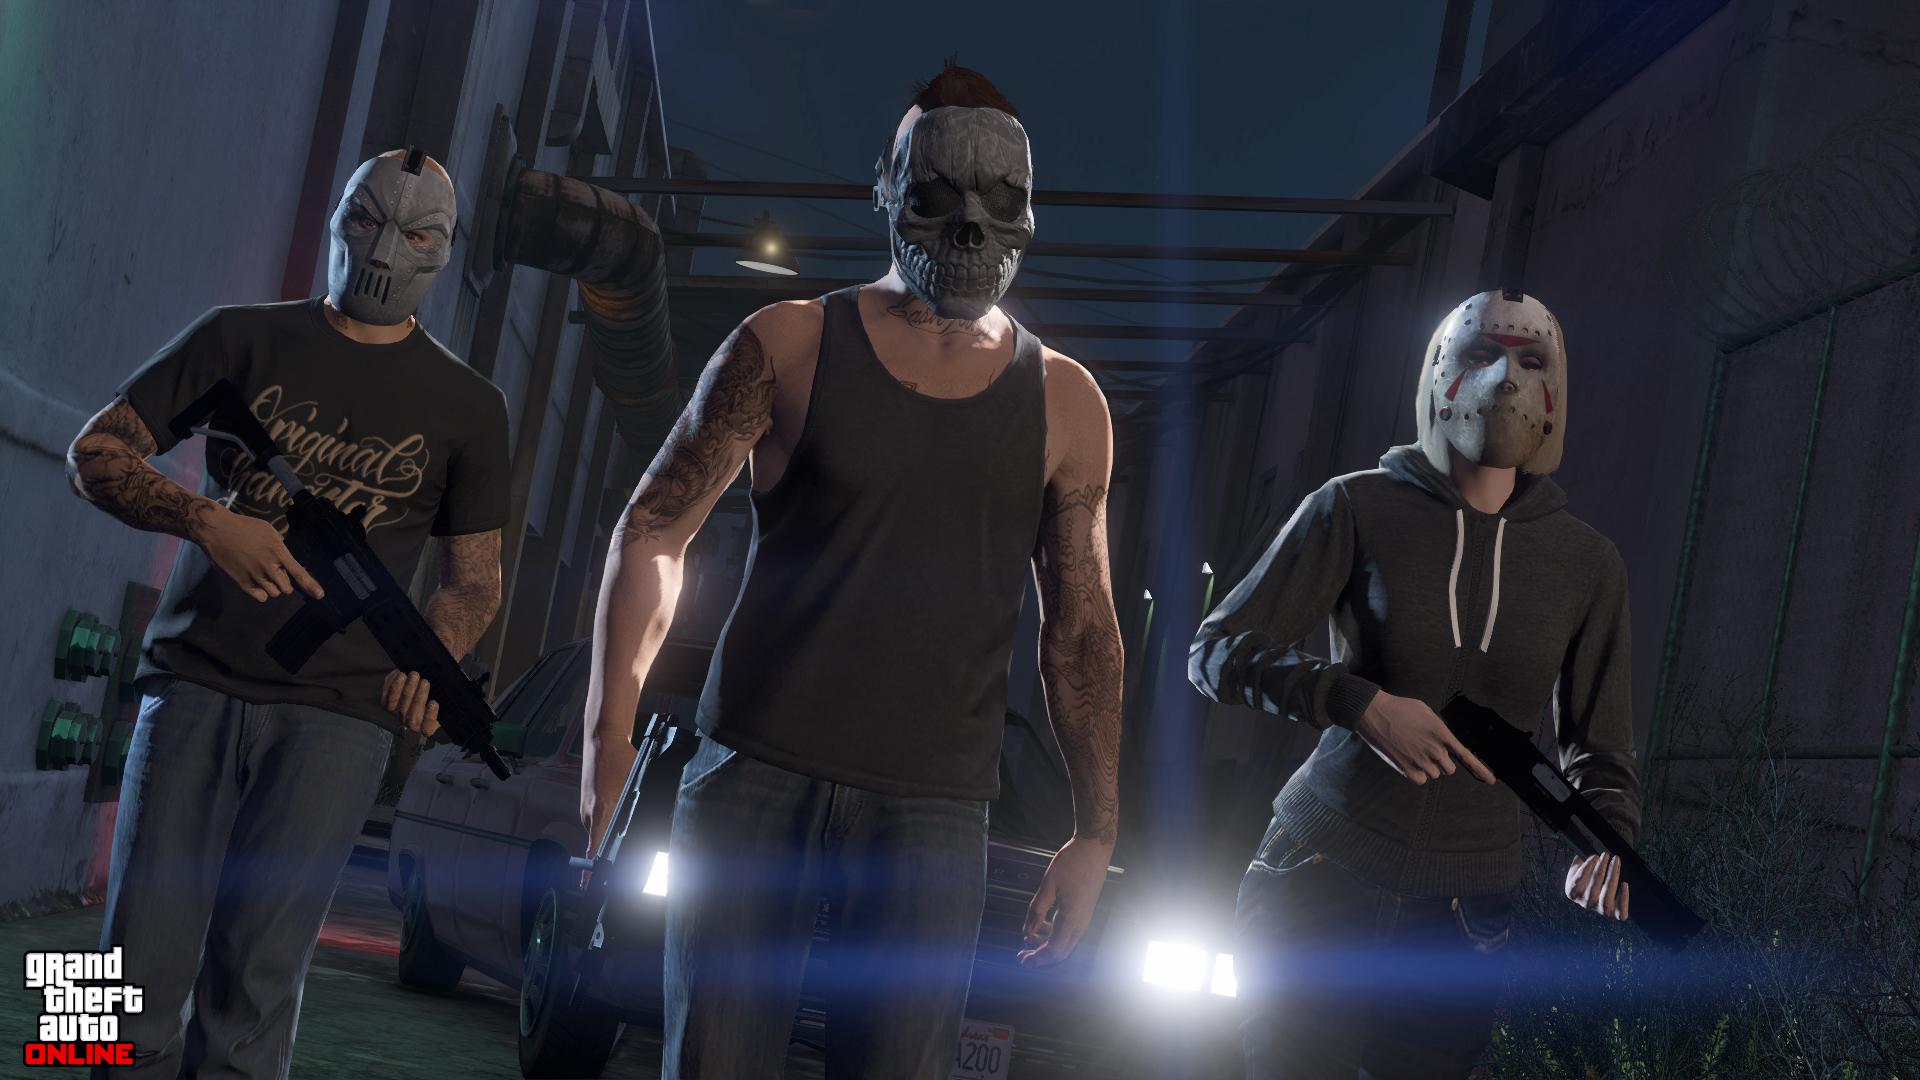 Grand Theft Auto Online Hd